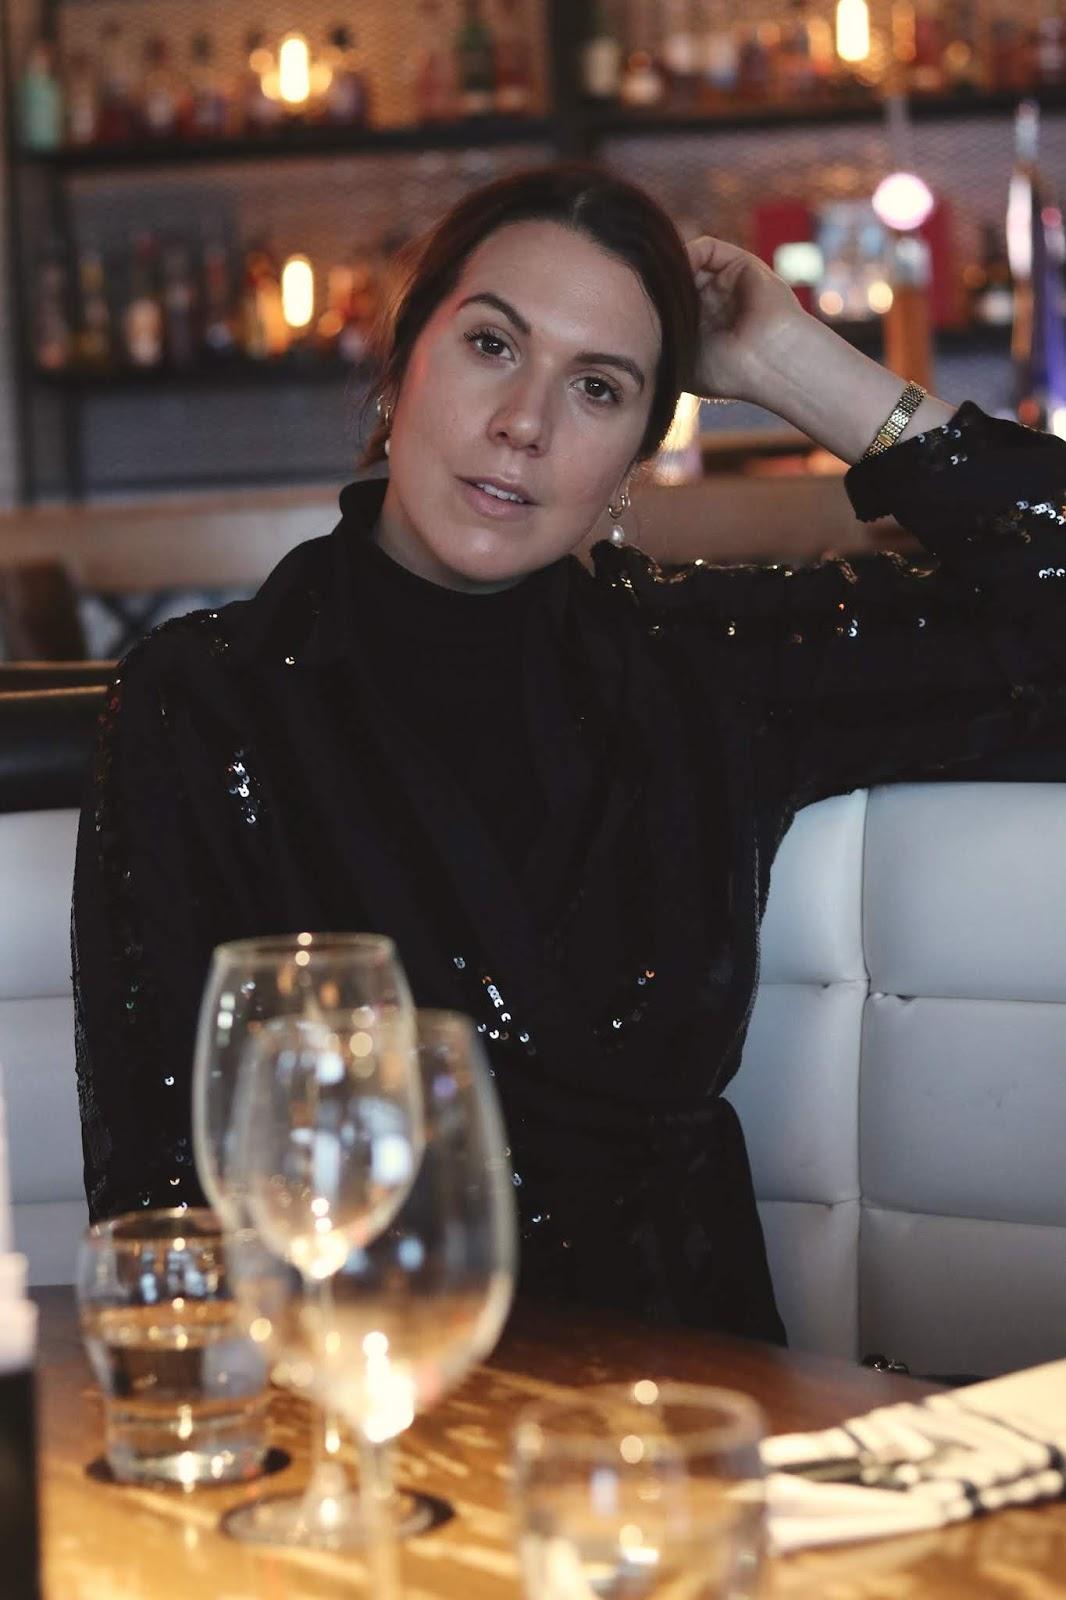 le chateau sequin blouse festive party nye outfit idea vancouver blogger aleesha harris